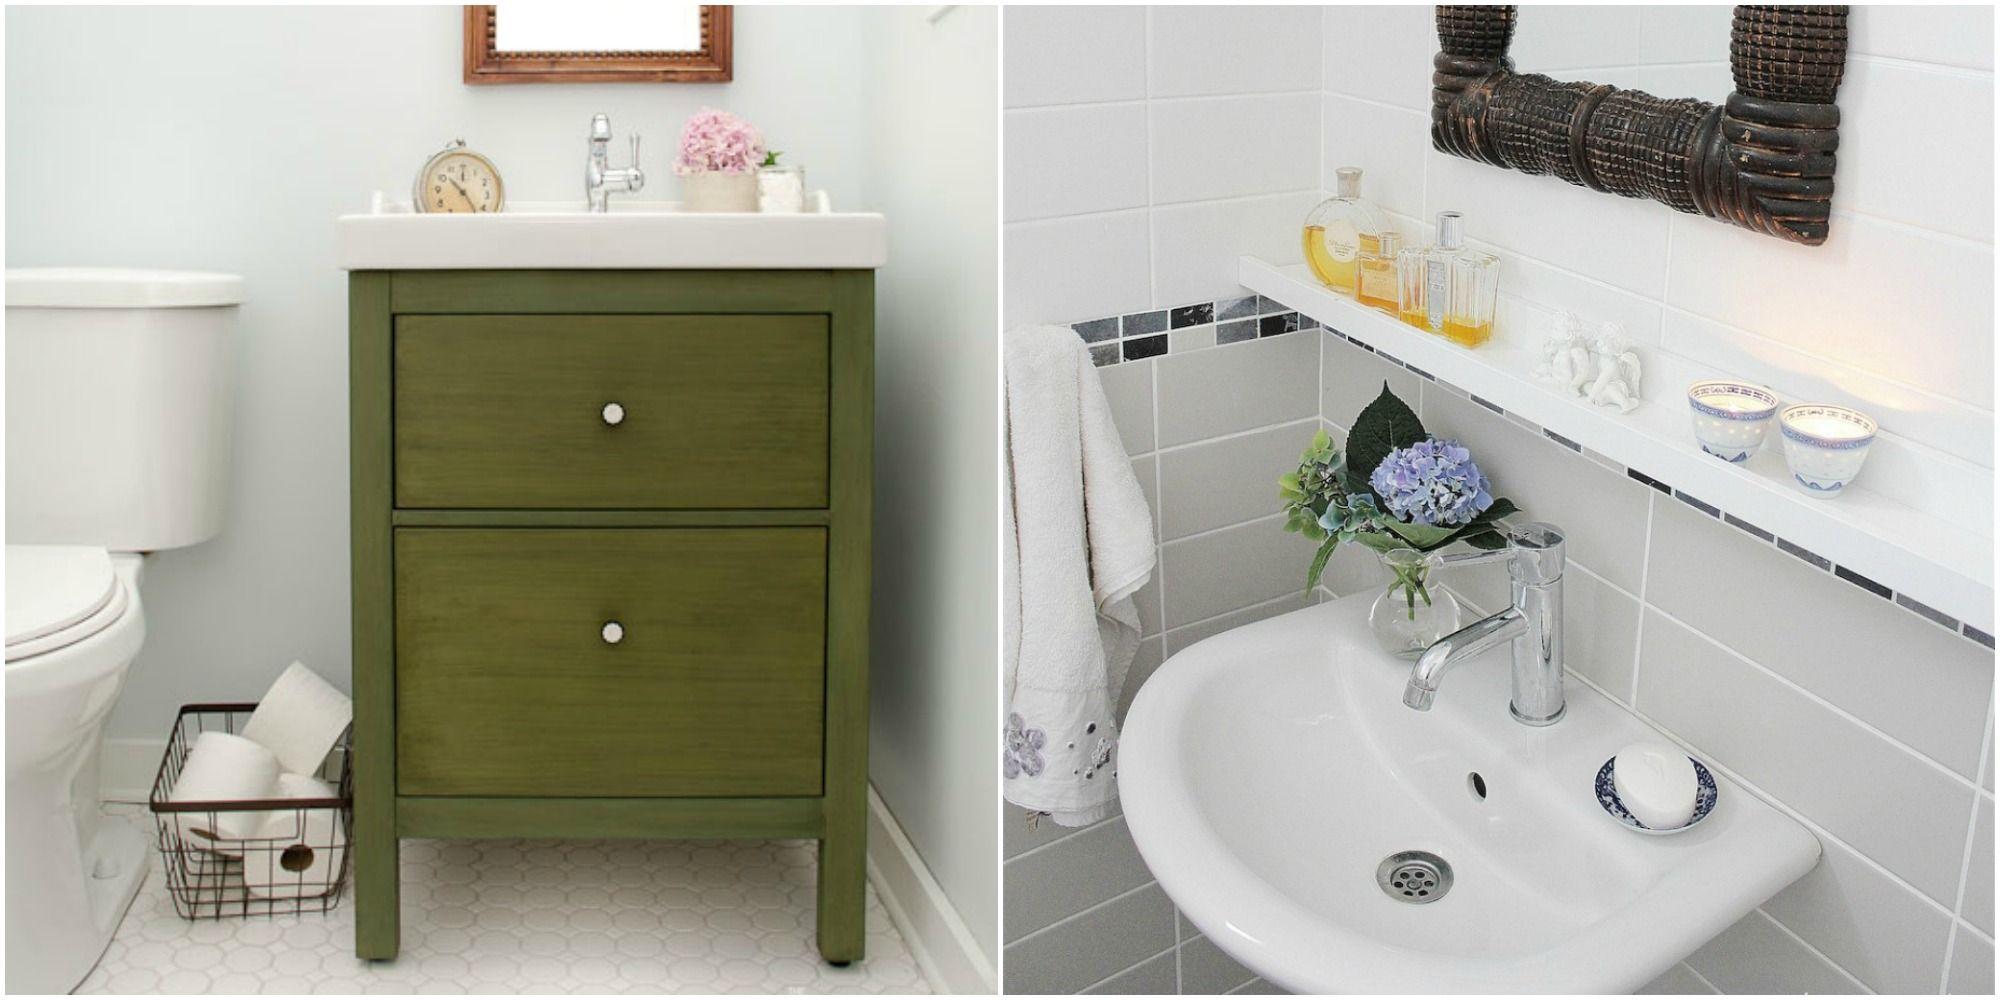 11 ikea bathroom hacks new uses for